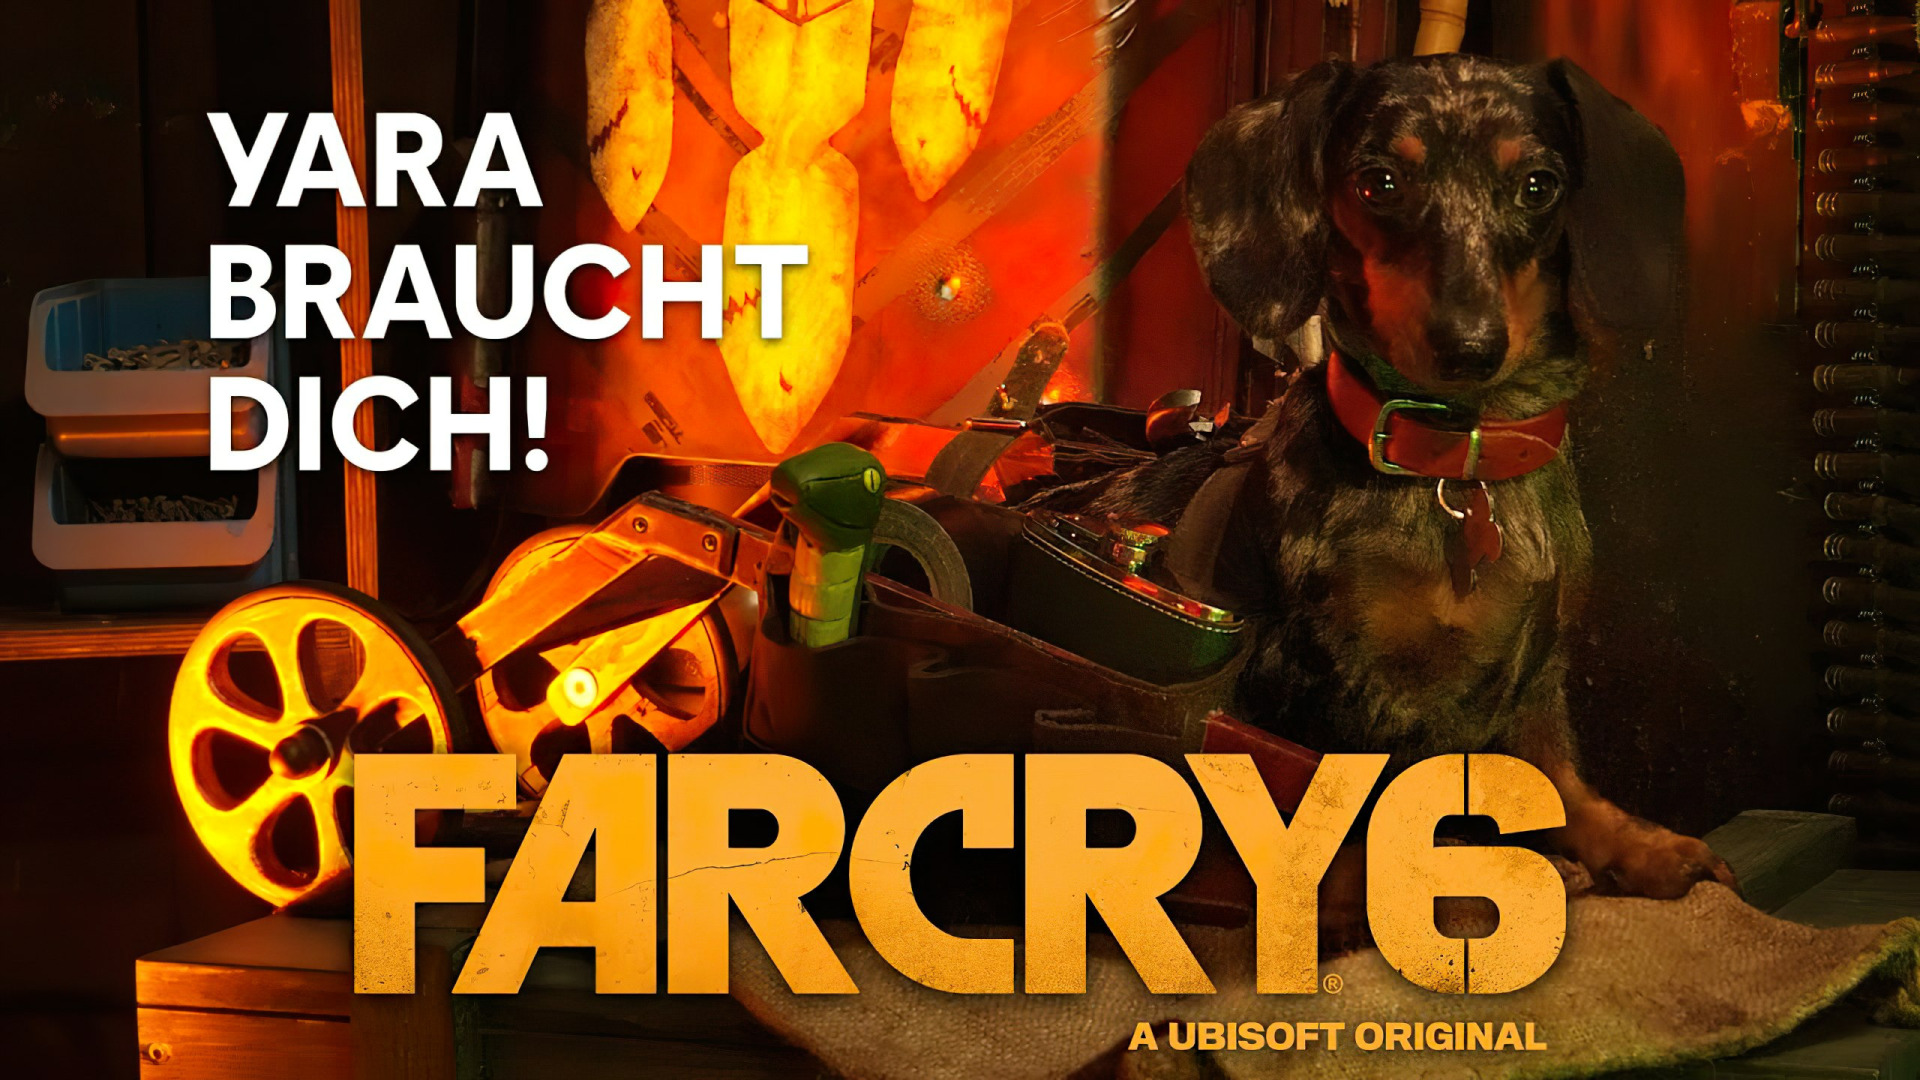 Trailer, Ego-Shooter, Ubisoft, Shooter, Far Cry, Far Cry 6